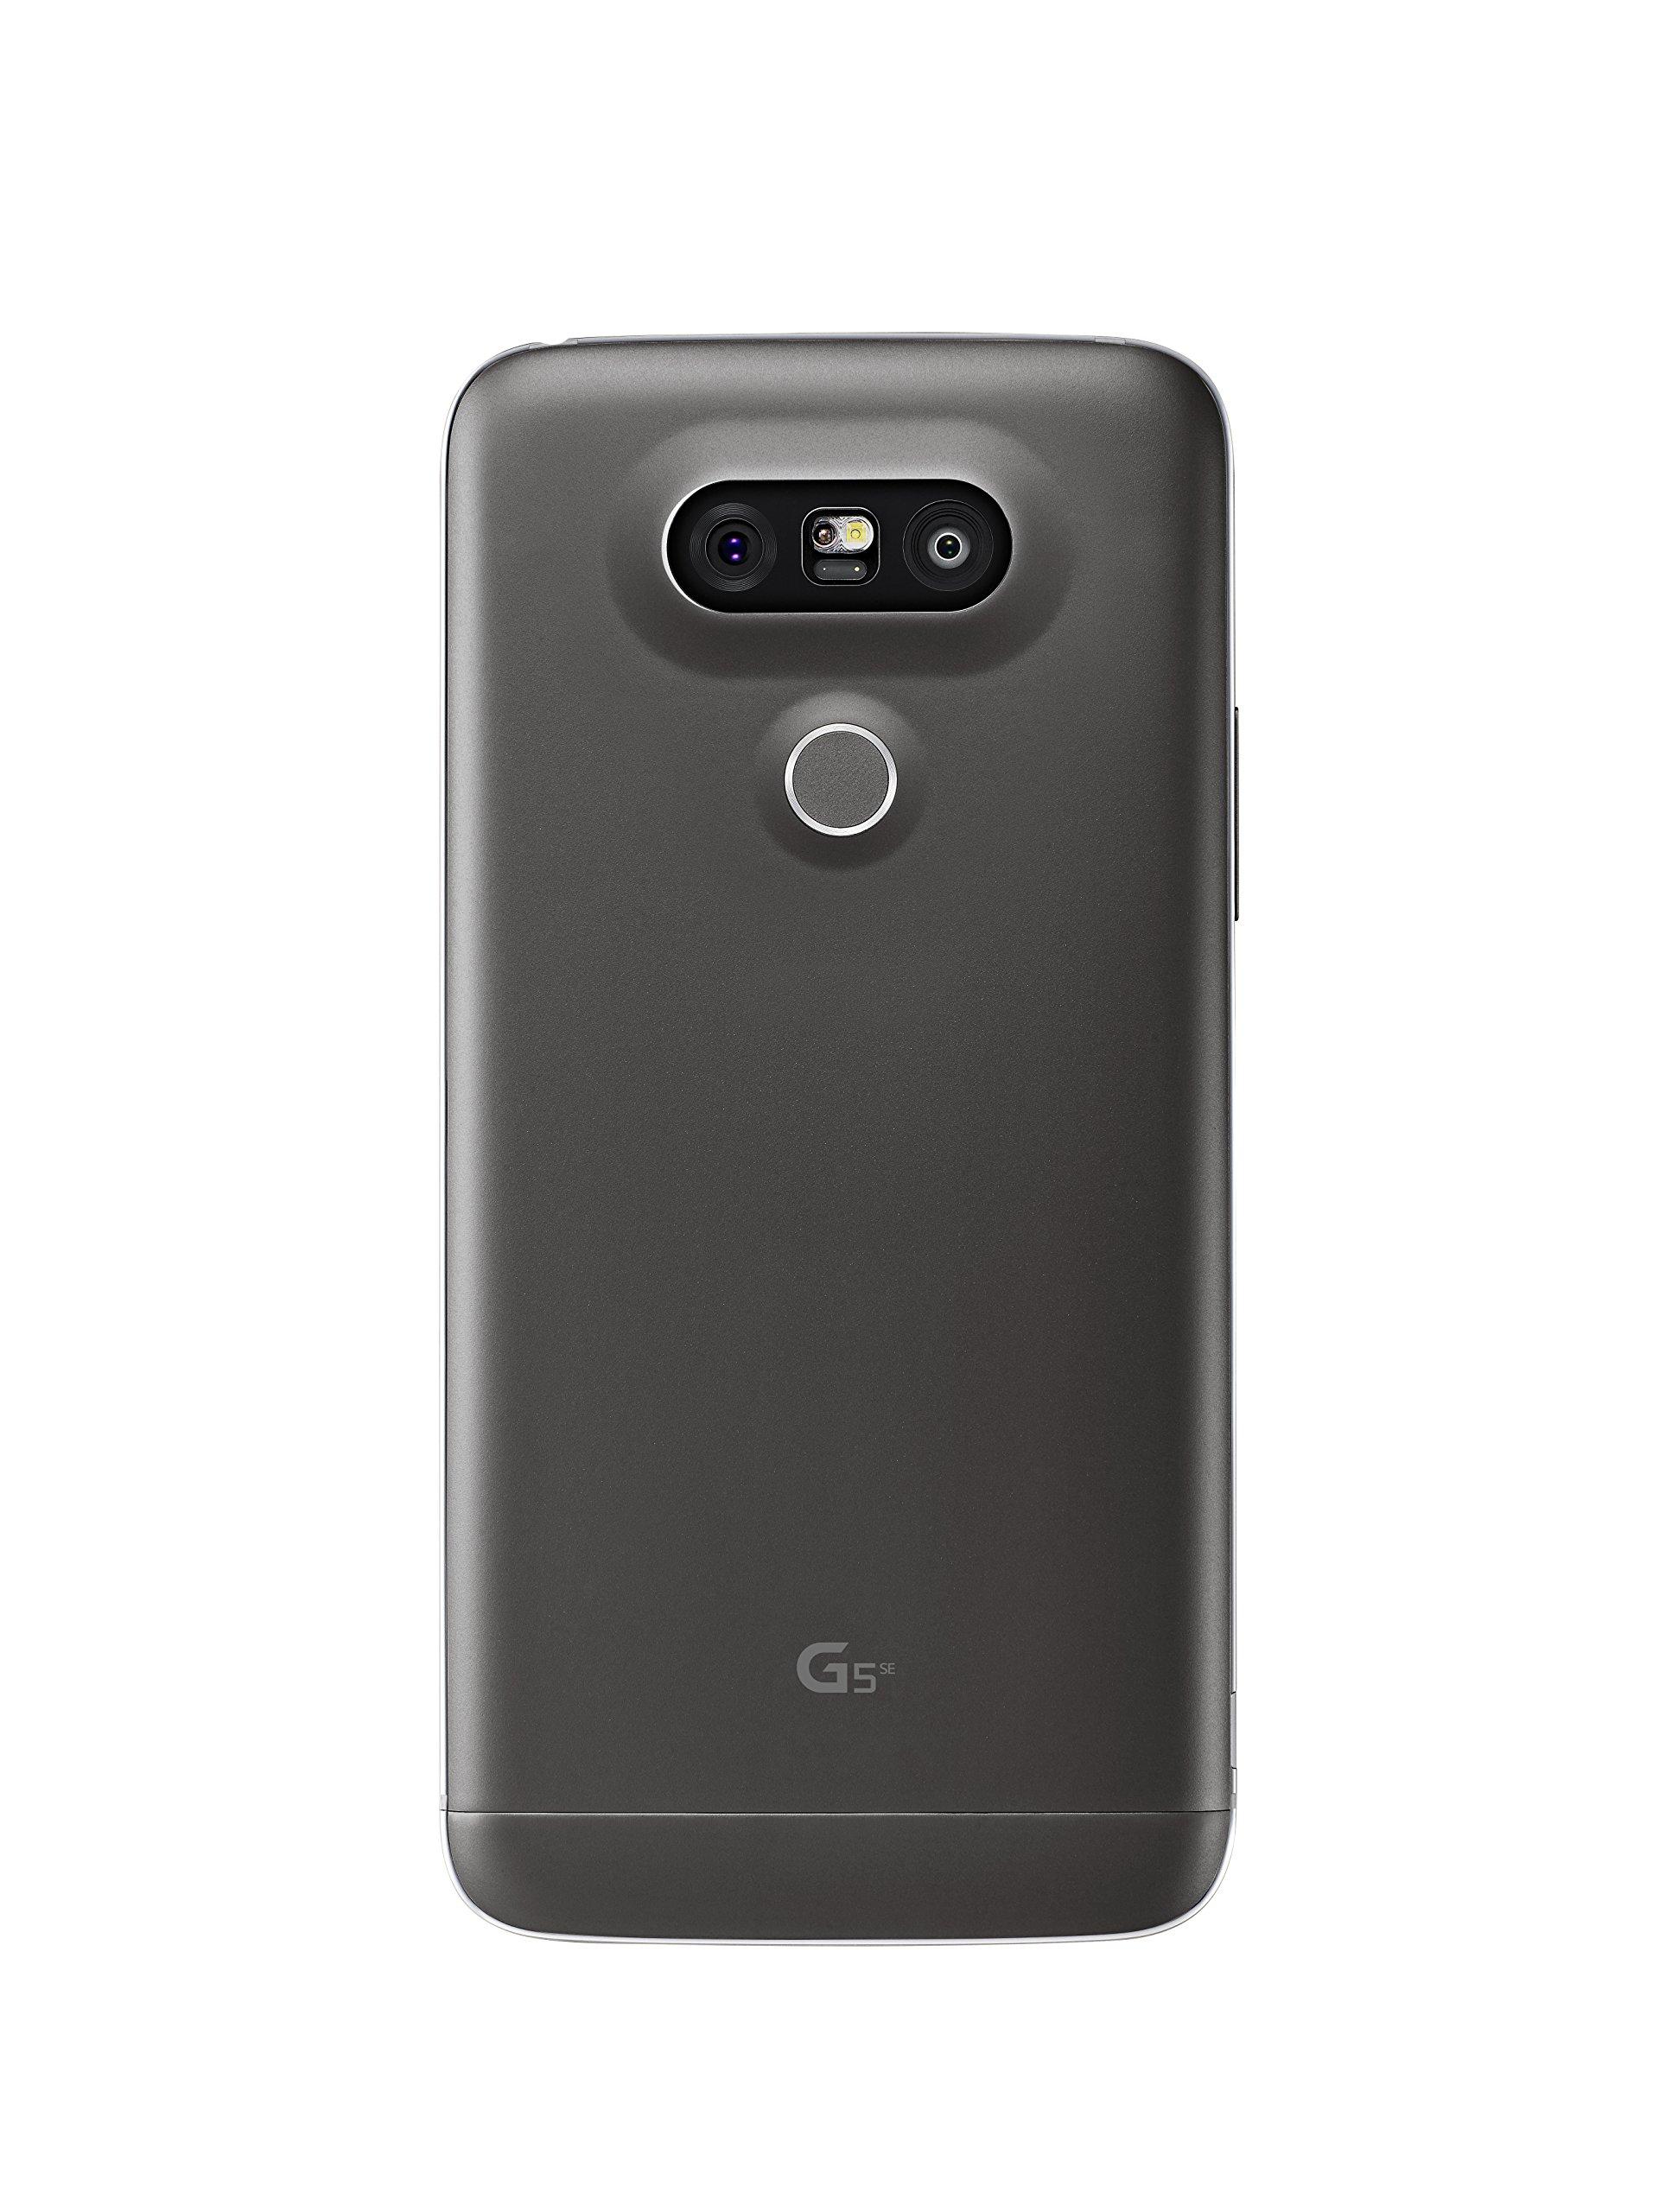 SMARTPHONE LG G5 LITE GRIS - 5.3/13.4CM IPS: Amazon.es: Electrónica